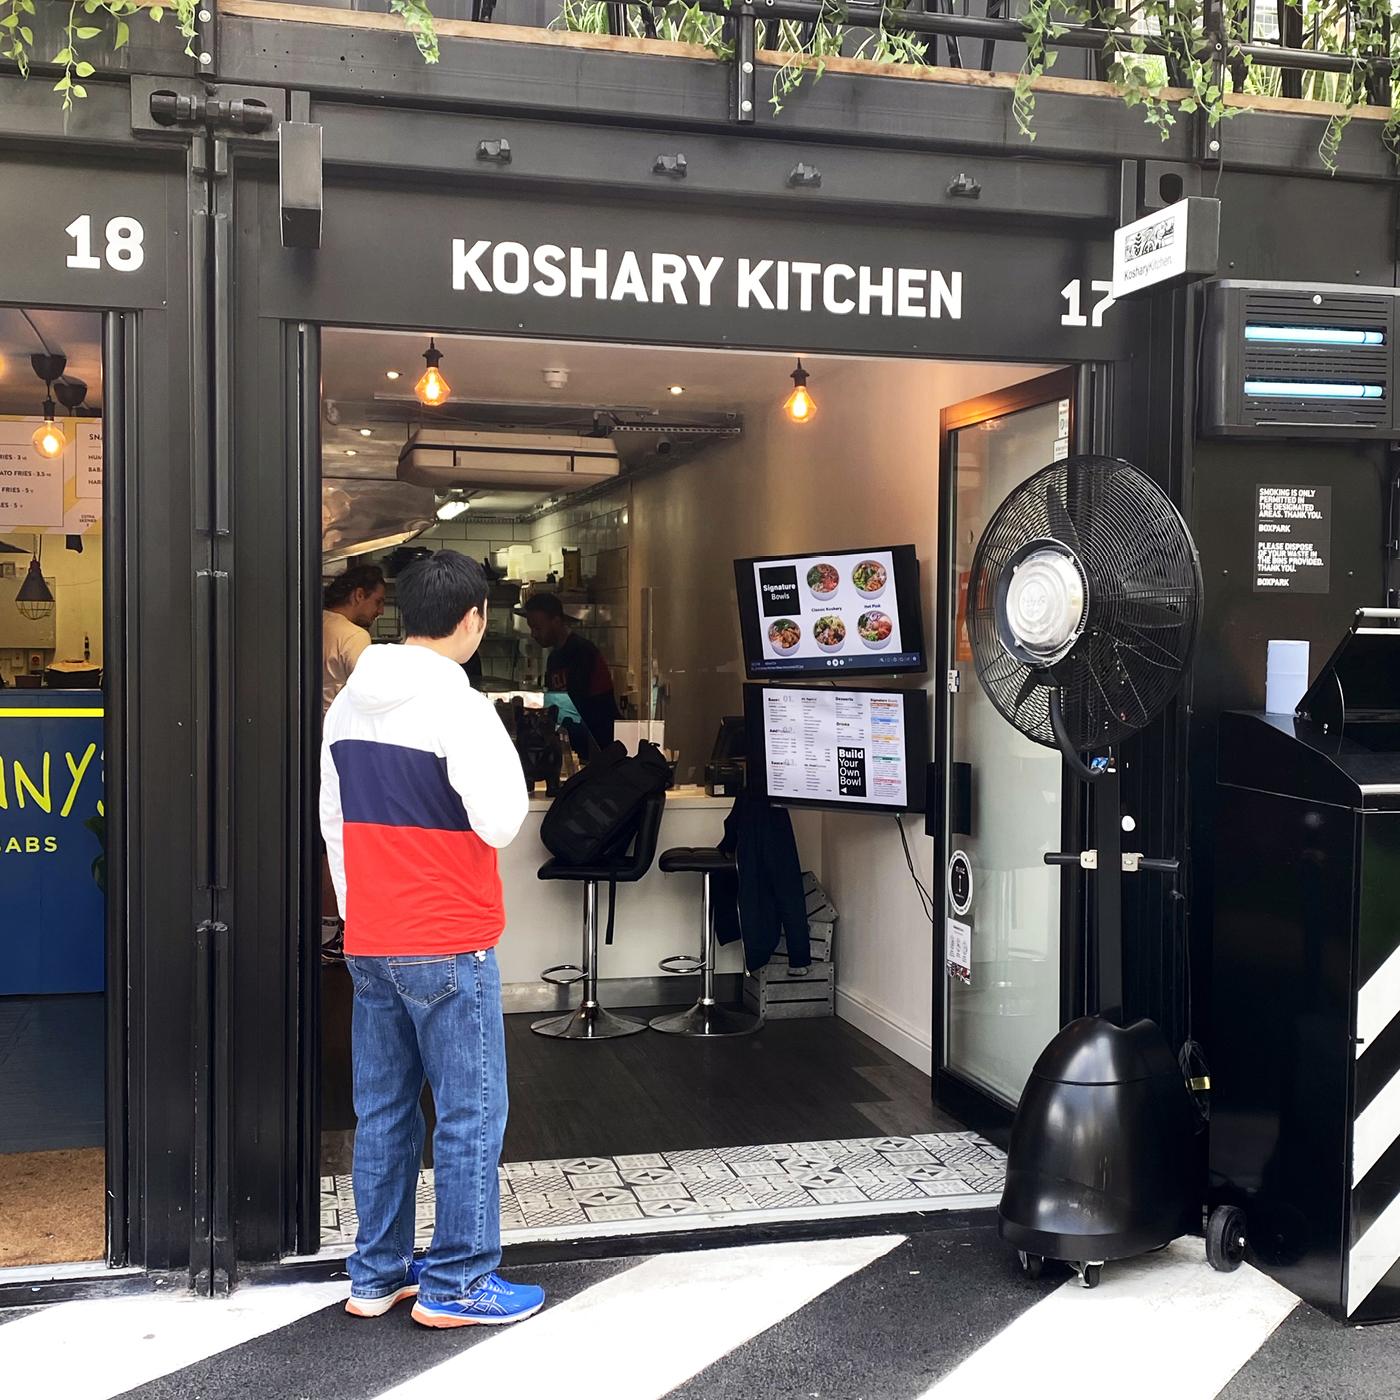 Koshary Kitchen